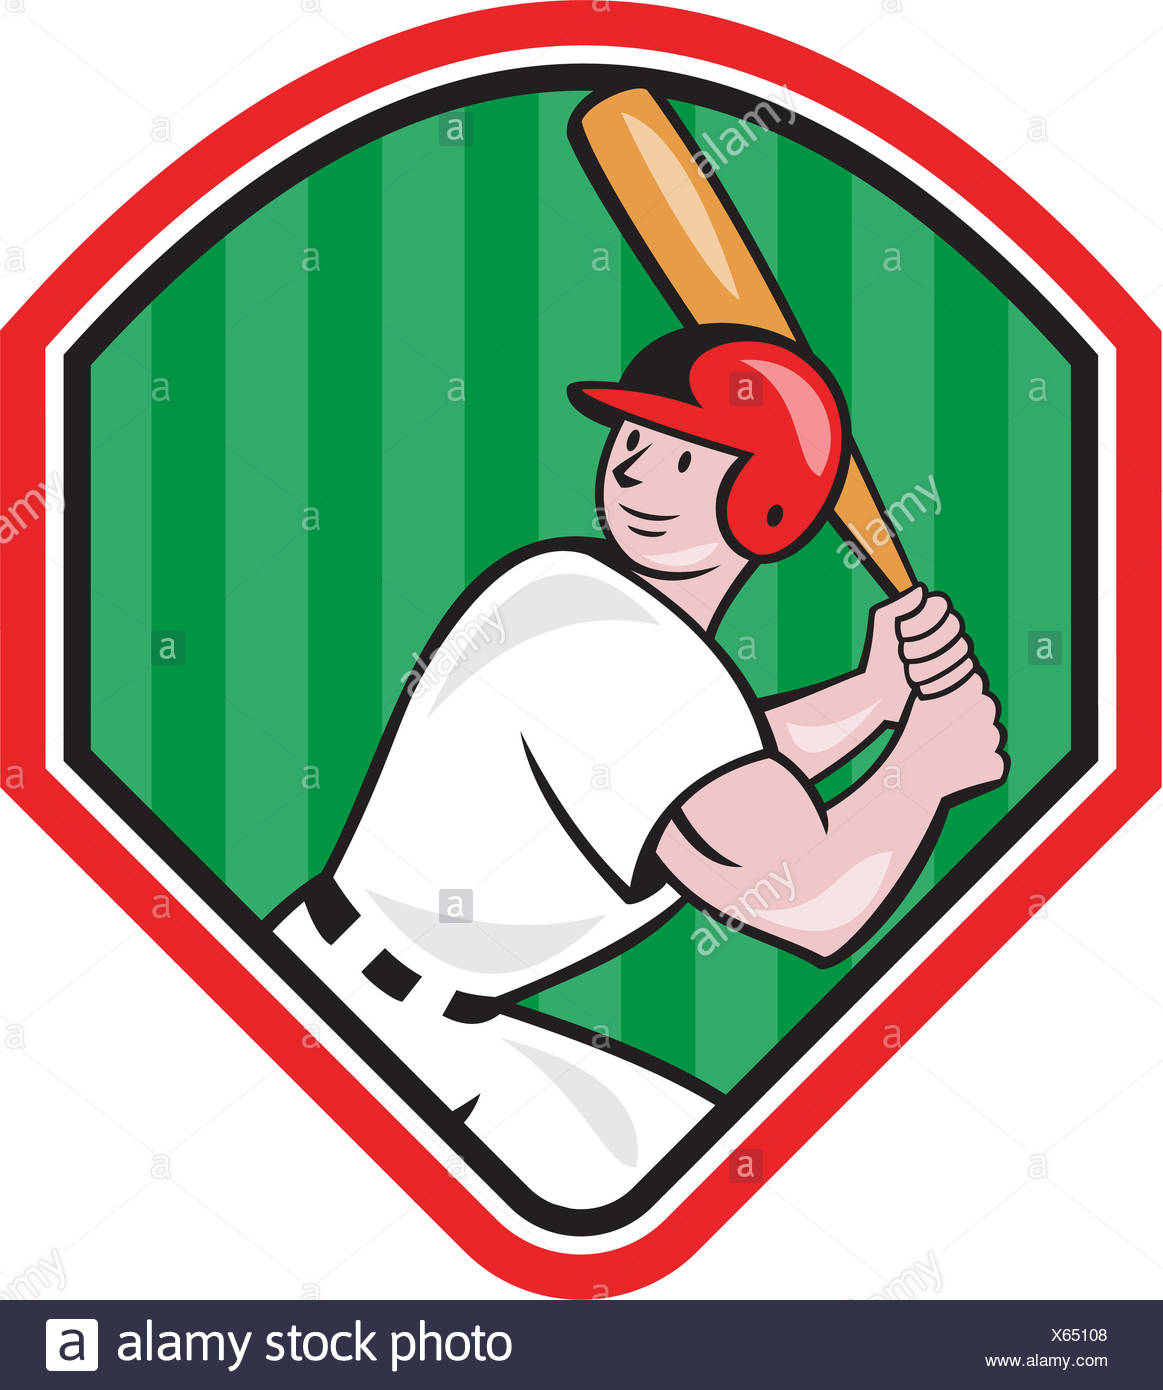 American Baseball Player Bat Diamond Cartoon Stock Photo Alamy